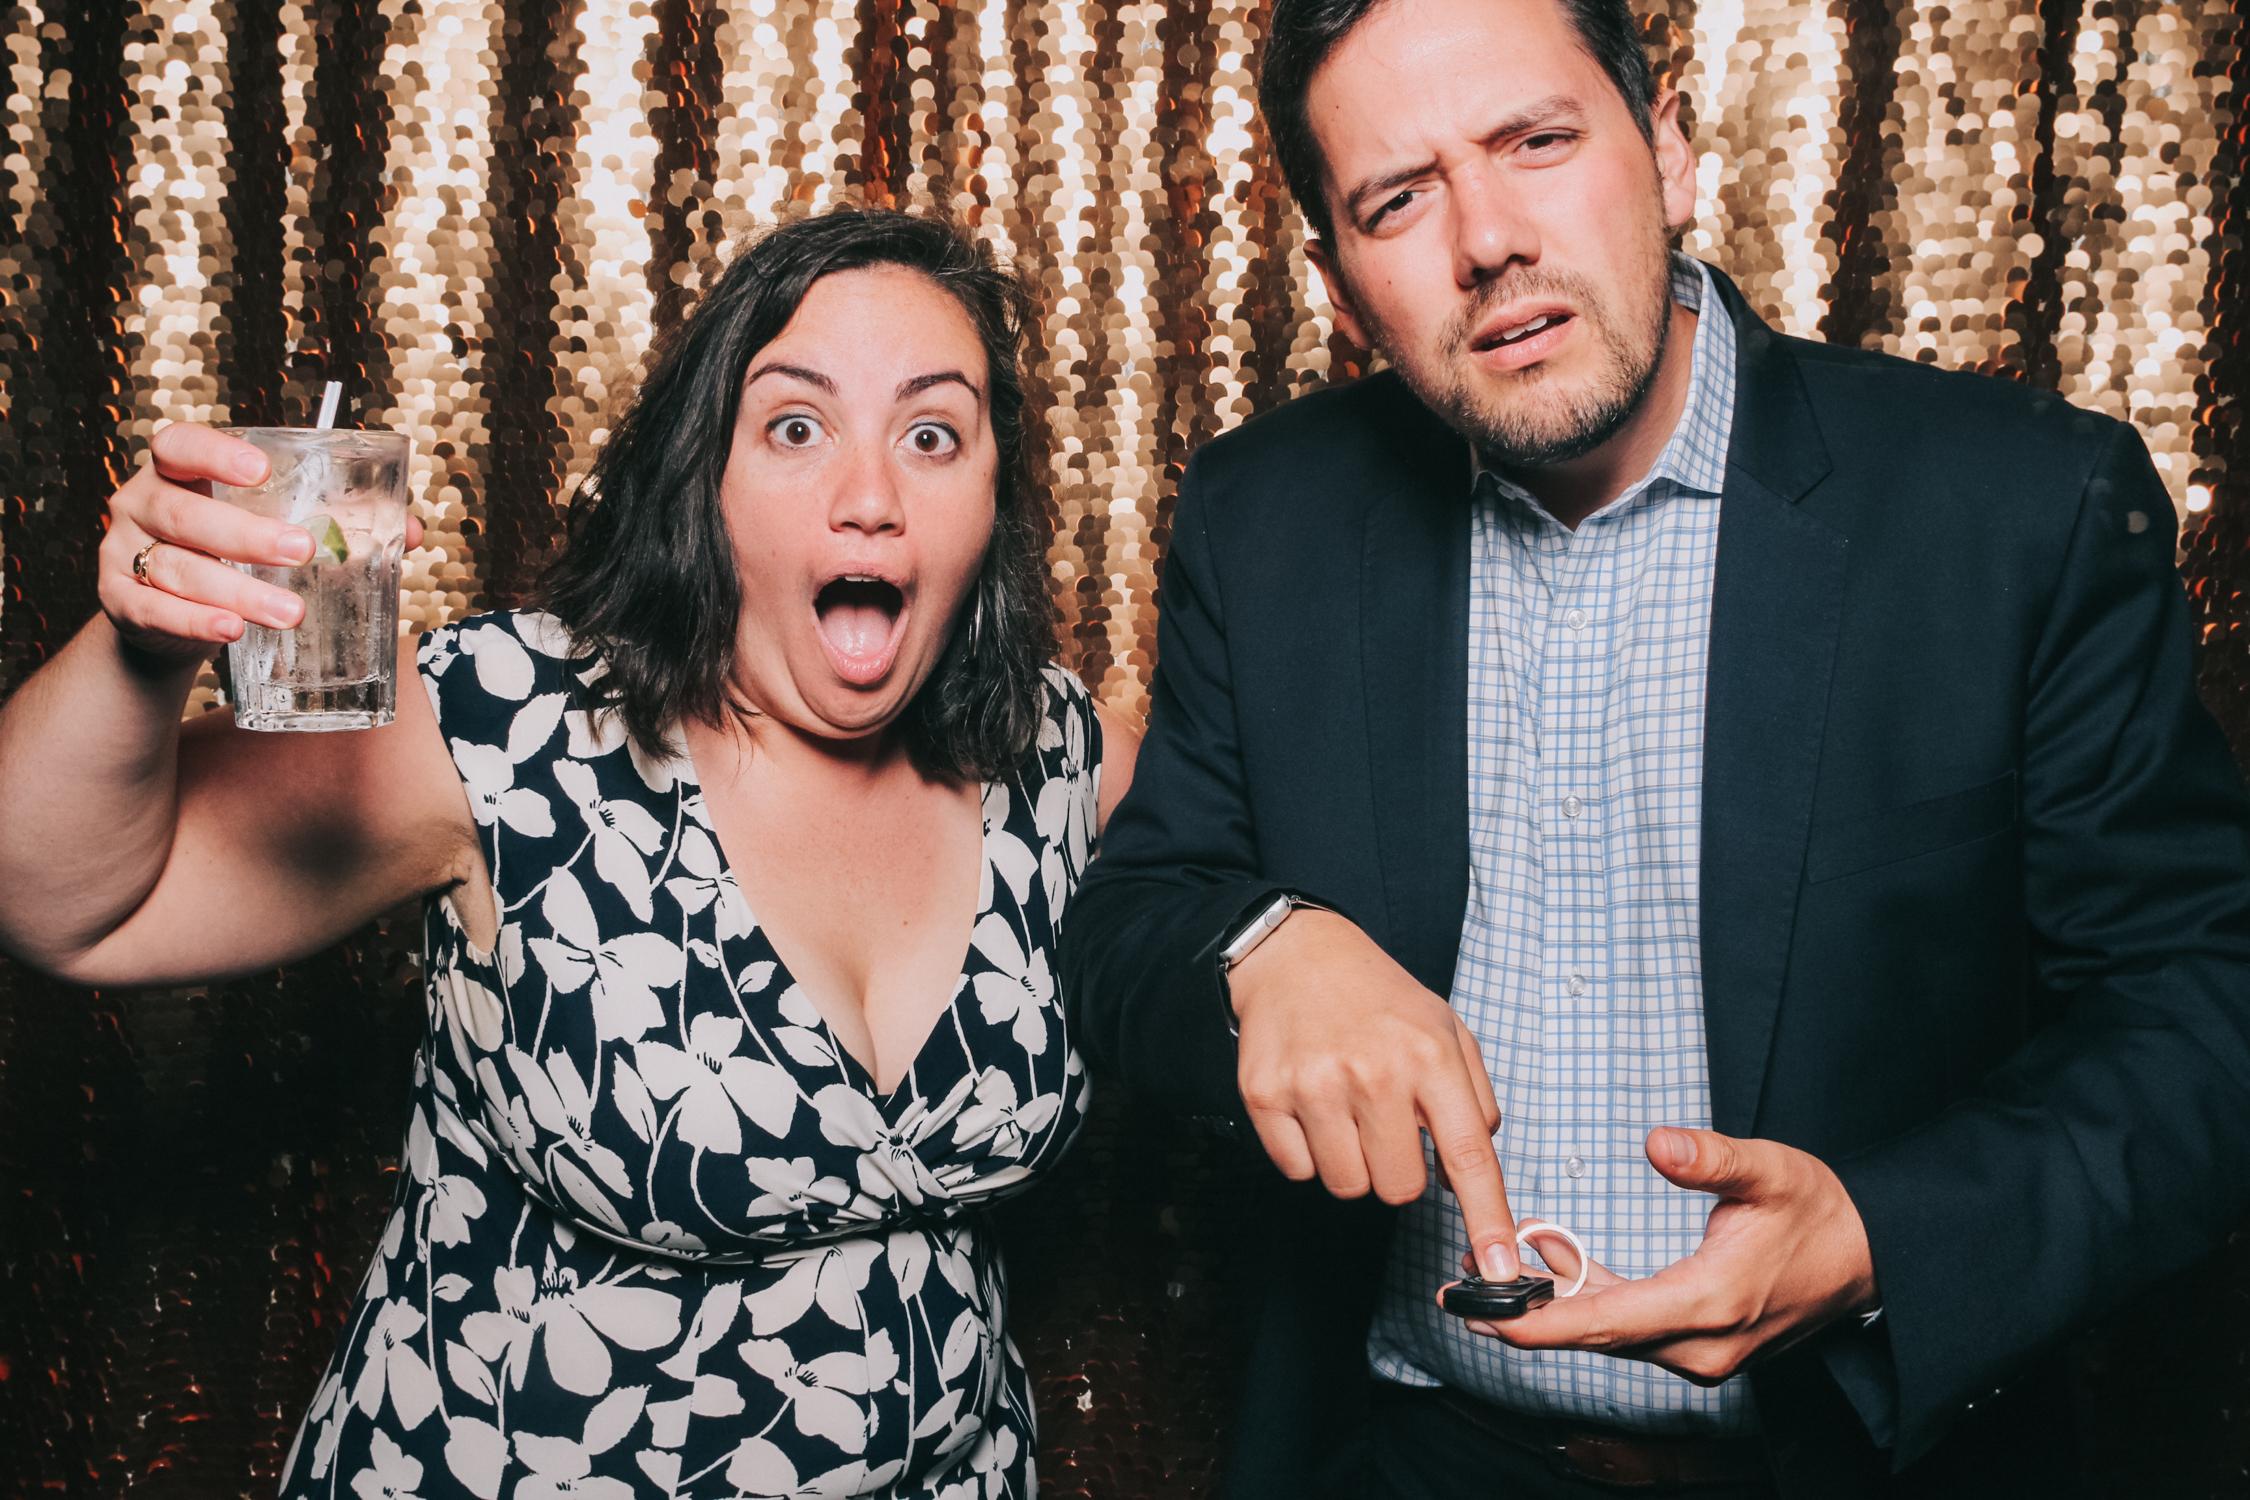 baltimore rusty scupper wedding photo booth-42.jpg